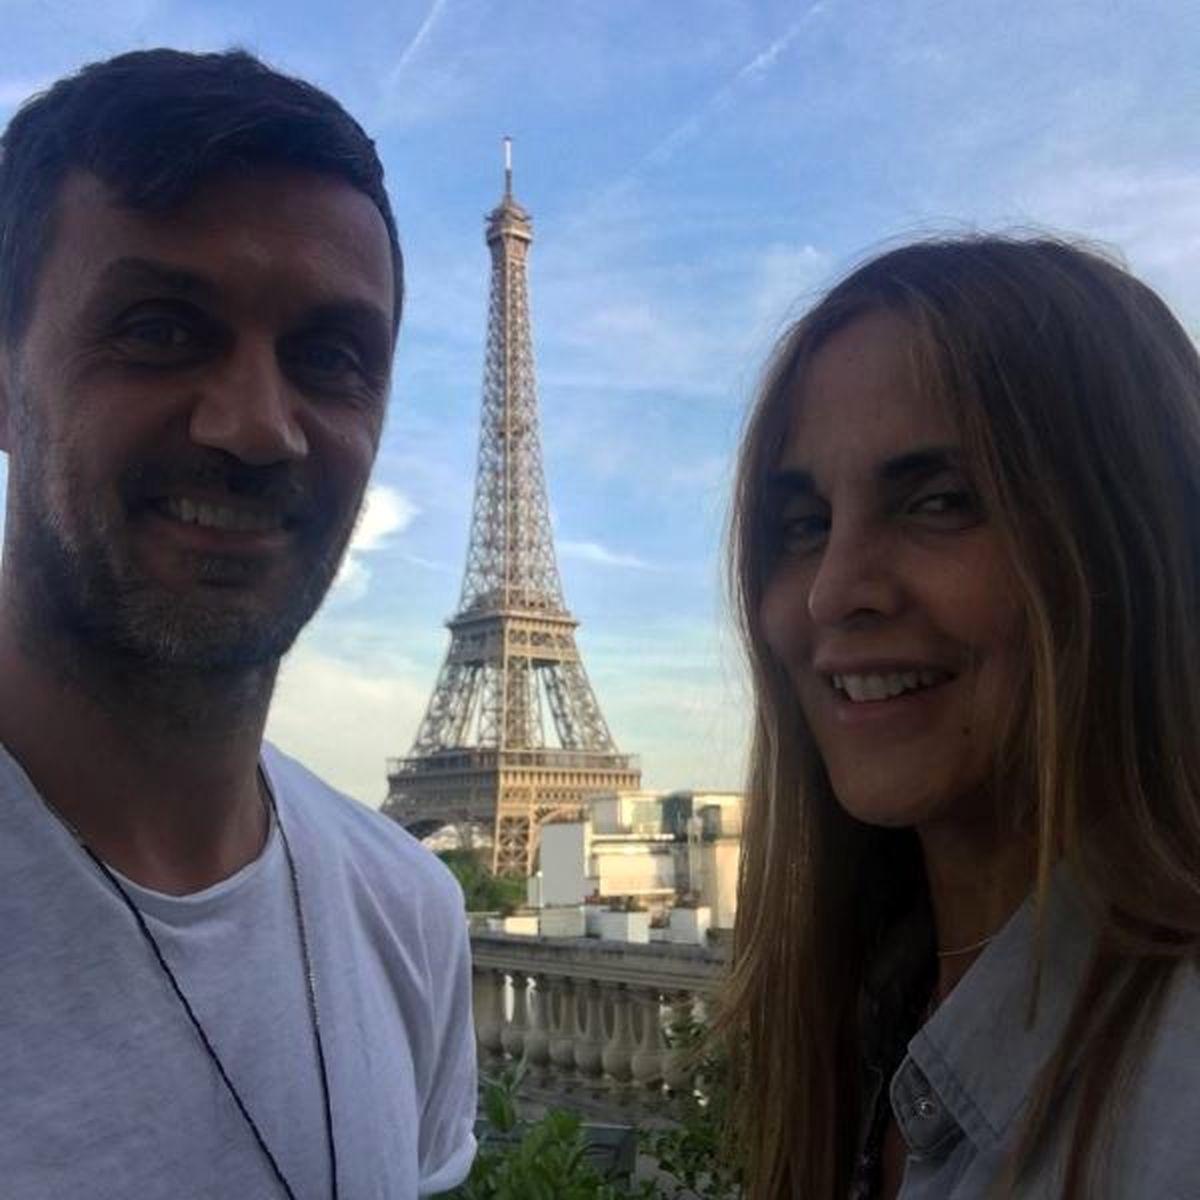 پائولو مالدینی و همسرش در فرانسه +تصاویر